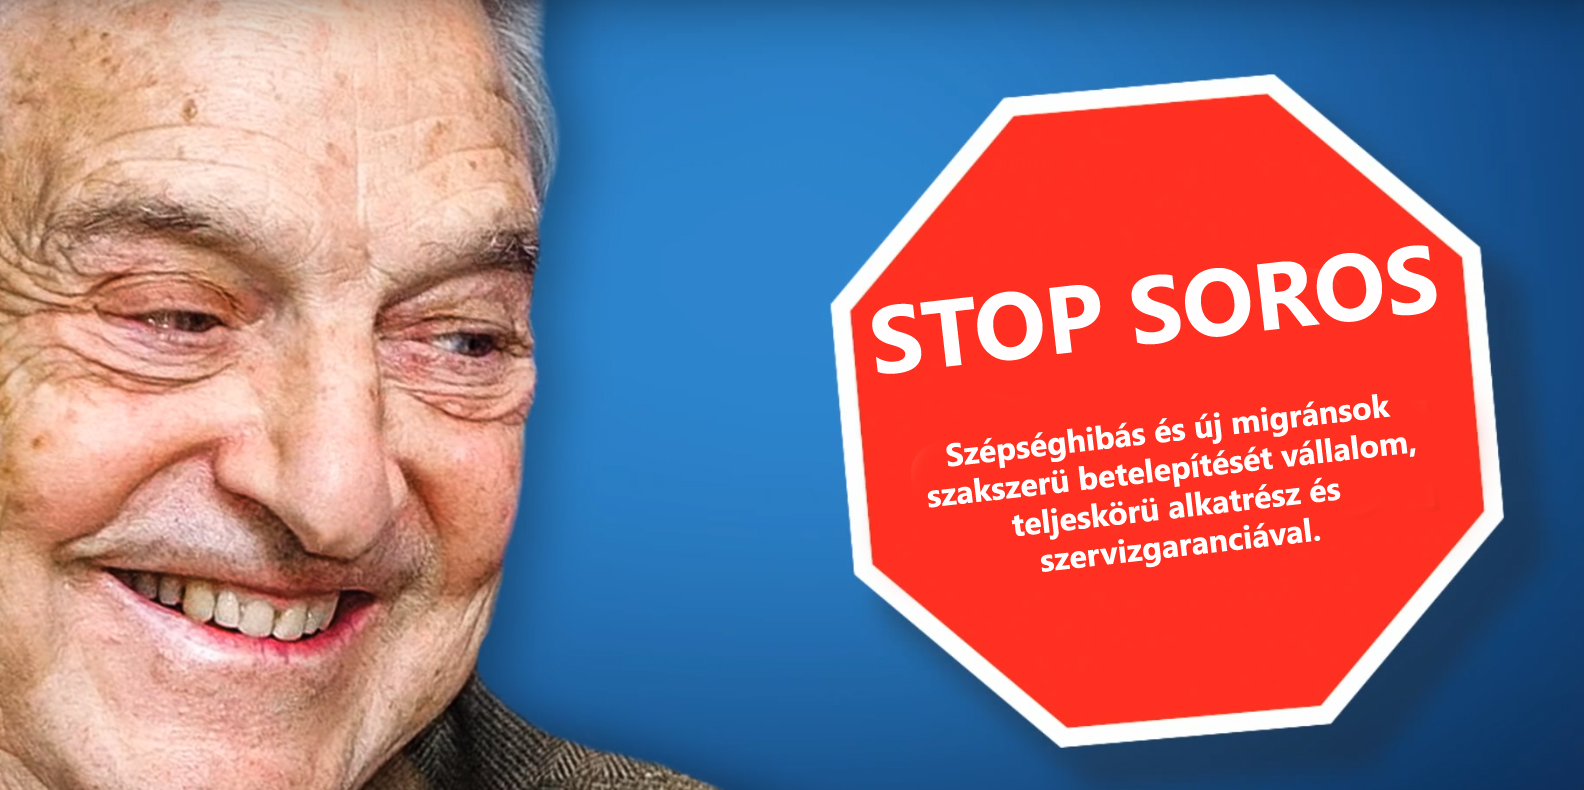 stop soros2